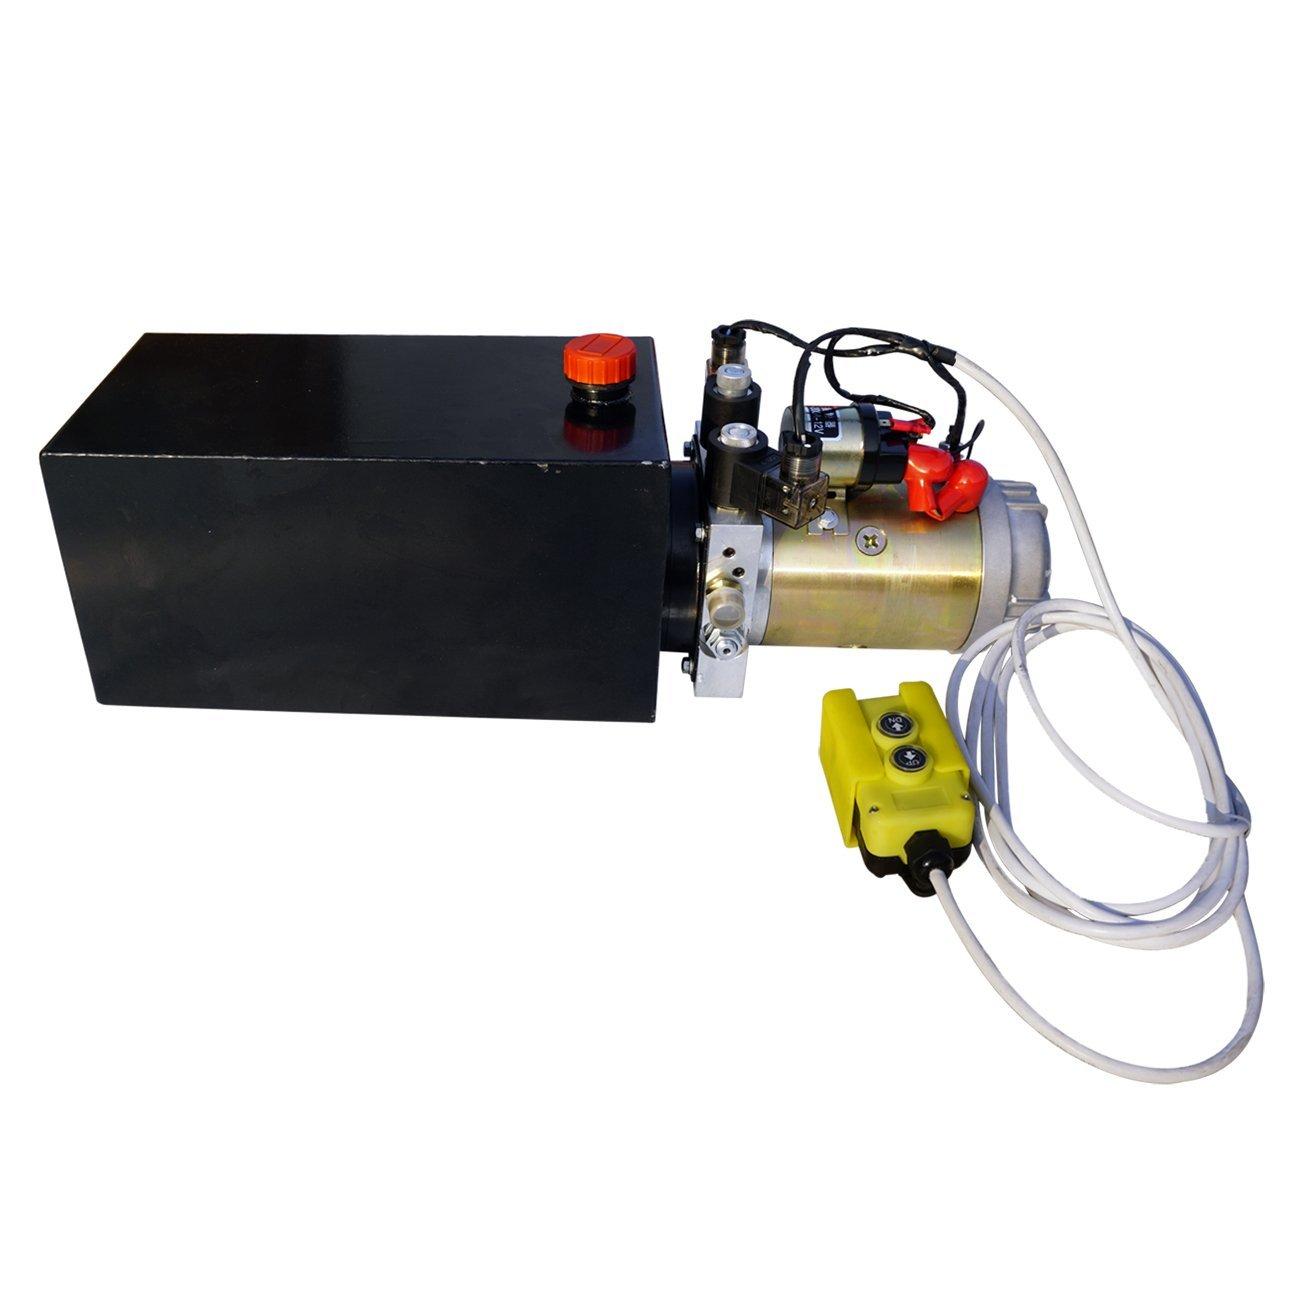 Electric Hydraulic Pump Unit Metal Reservoir For Dump Parker Wiring Diagram Trailer Double Acting 10 Quart Home Improvement